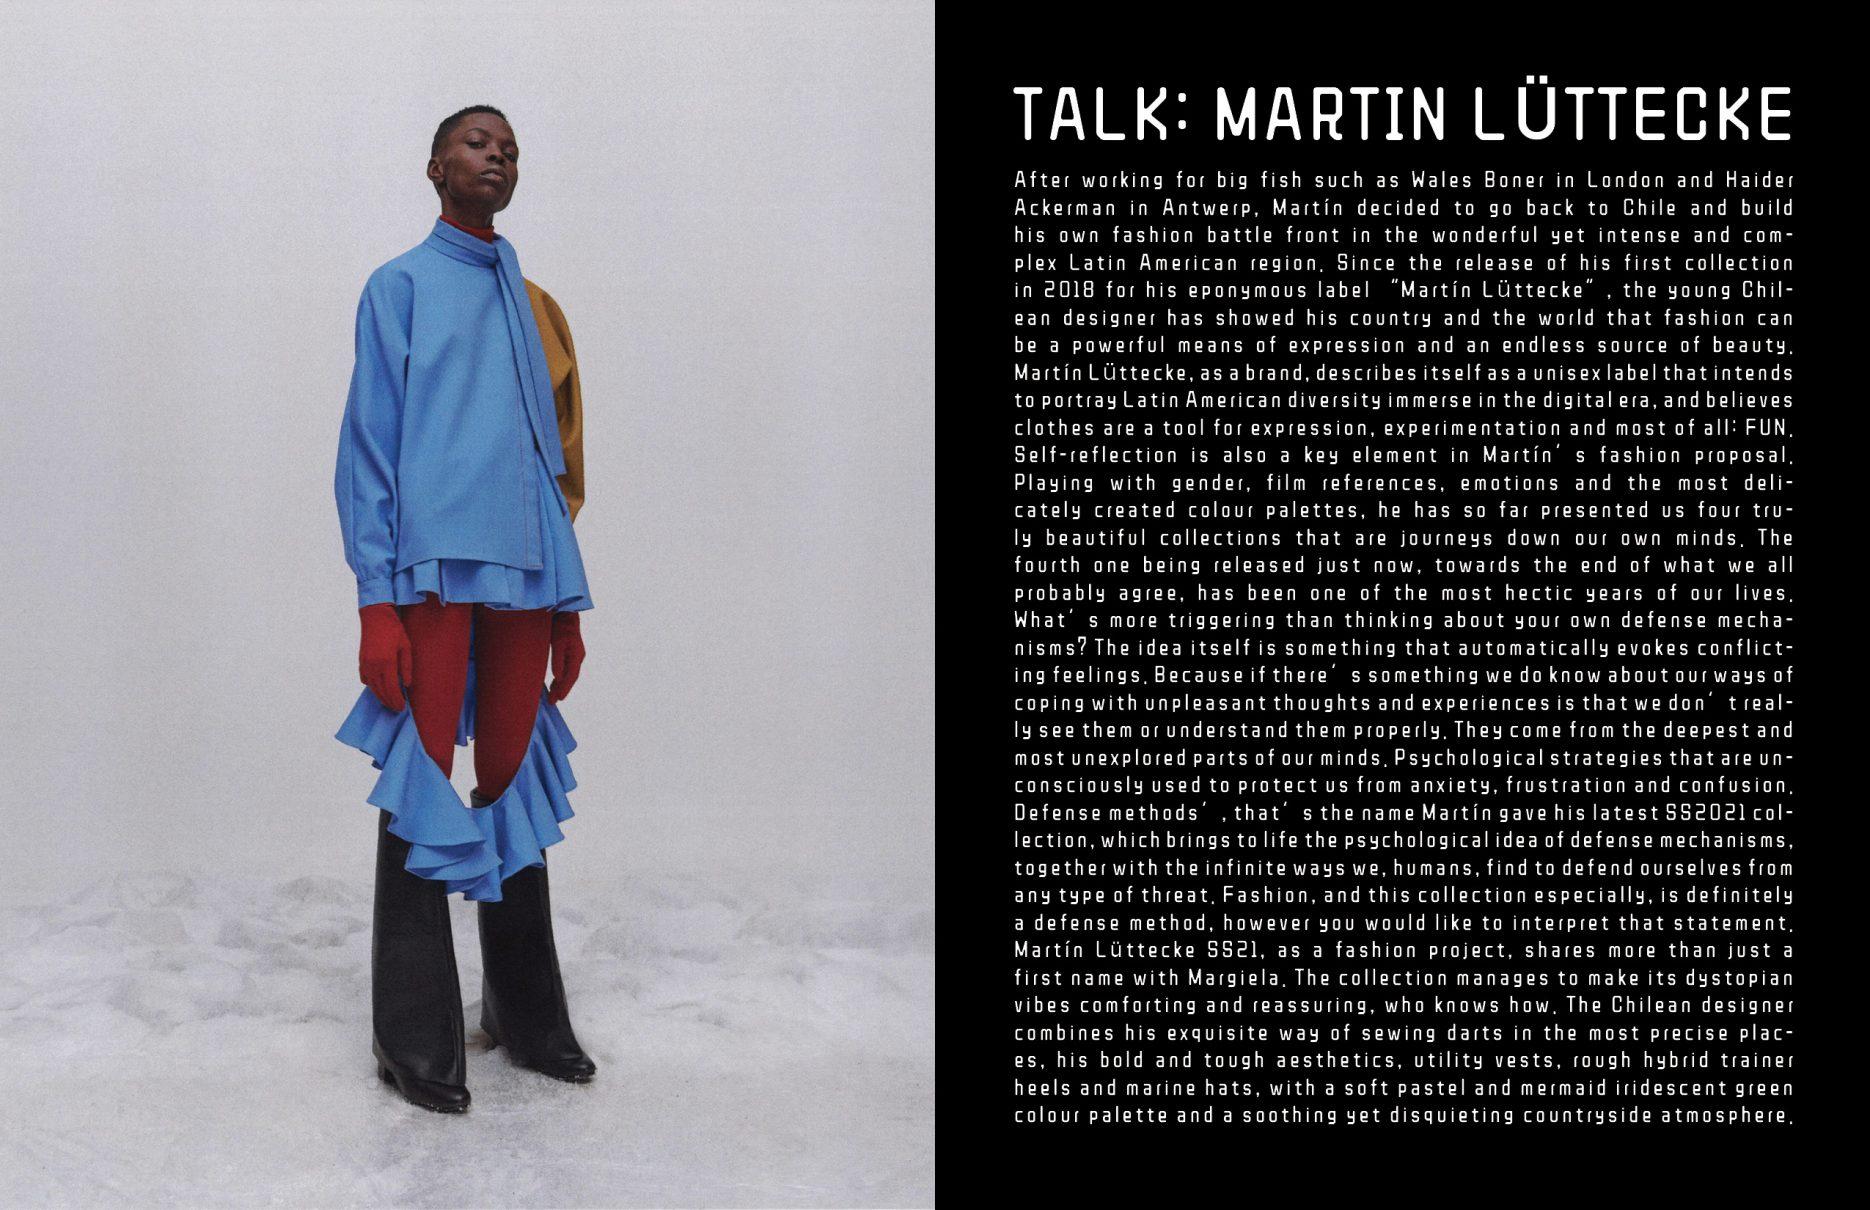 Martin luttecke keyi magazine fashion lookbook